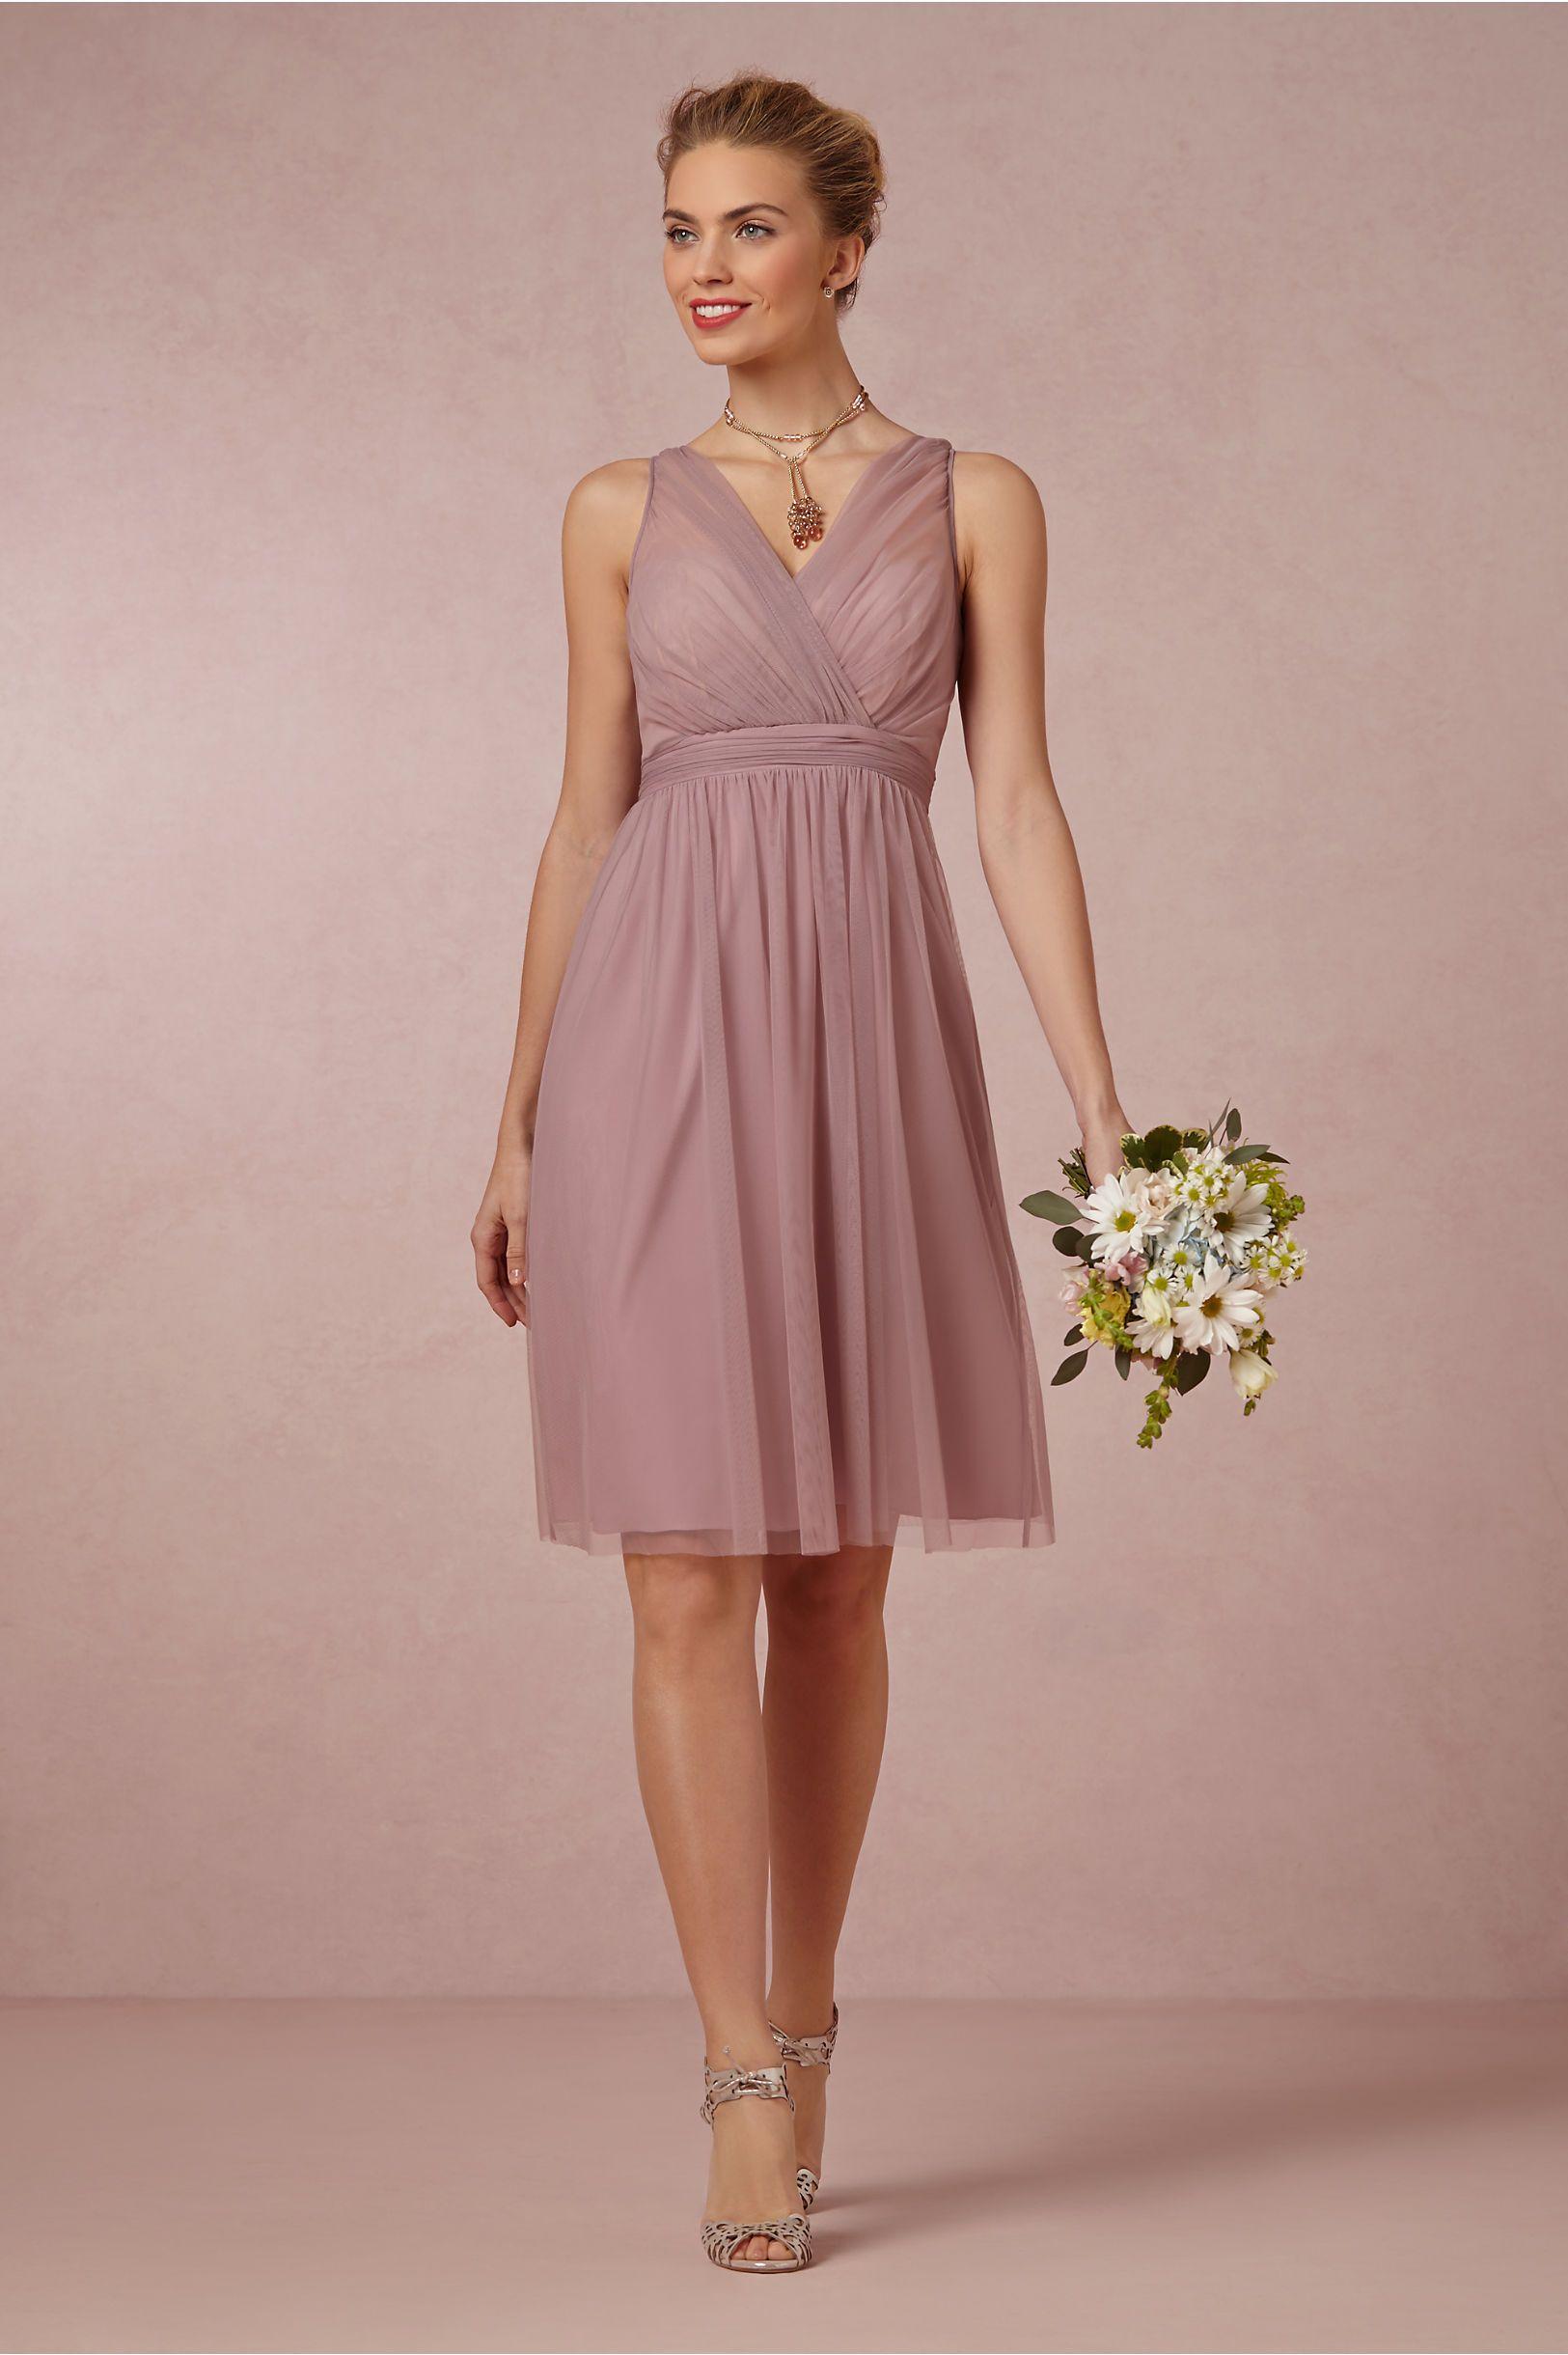 Tansy dress from bhldn bridesmaid dress blush mint or dusty tansy dress from bhldn bridesmaid dress blush mint or dusty rose ombrellifo Choice Image